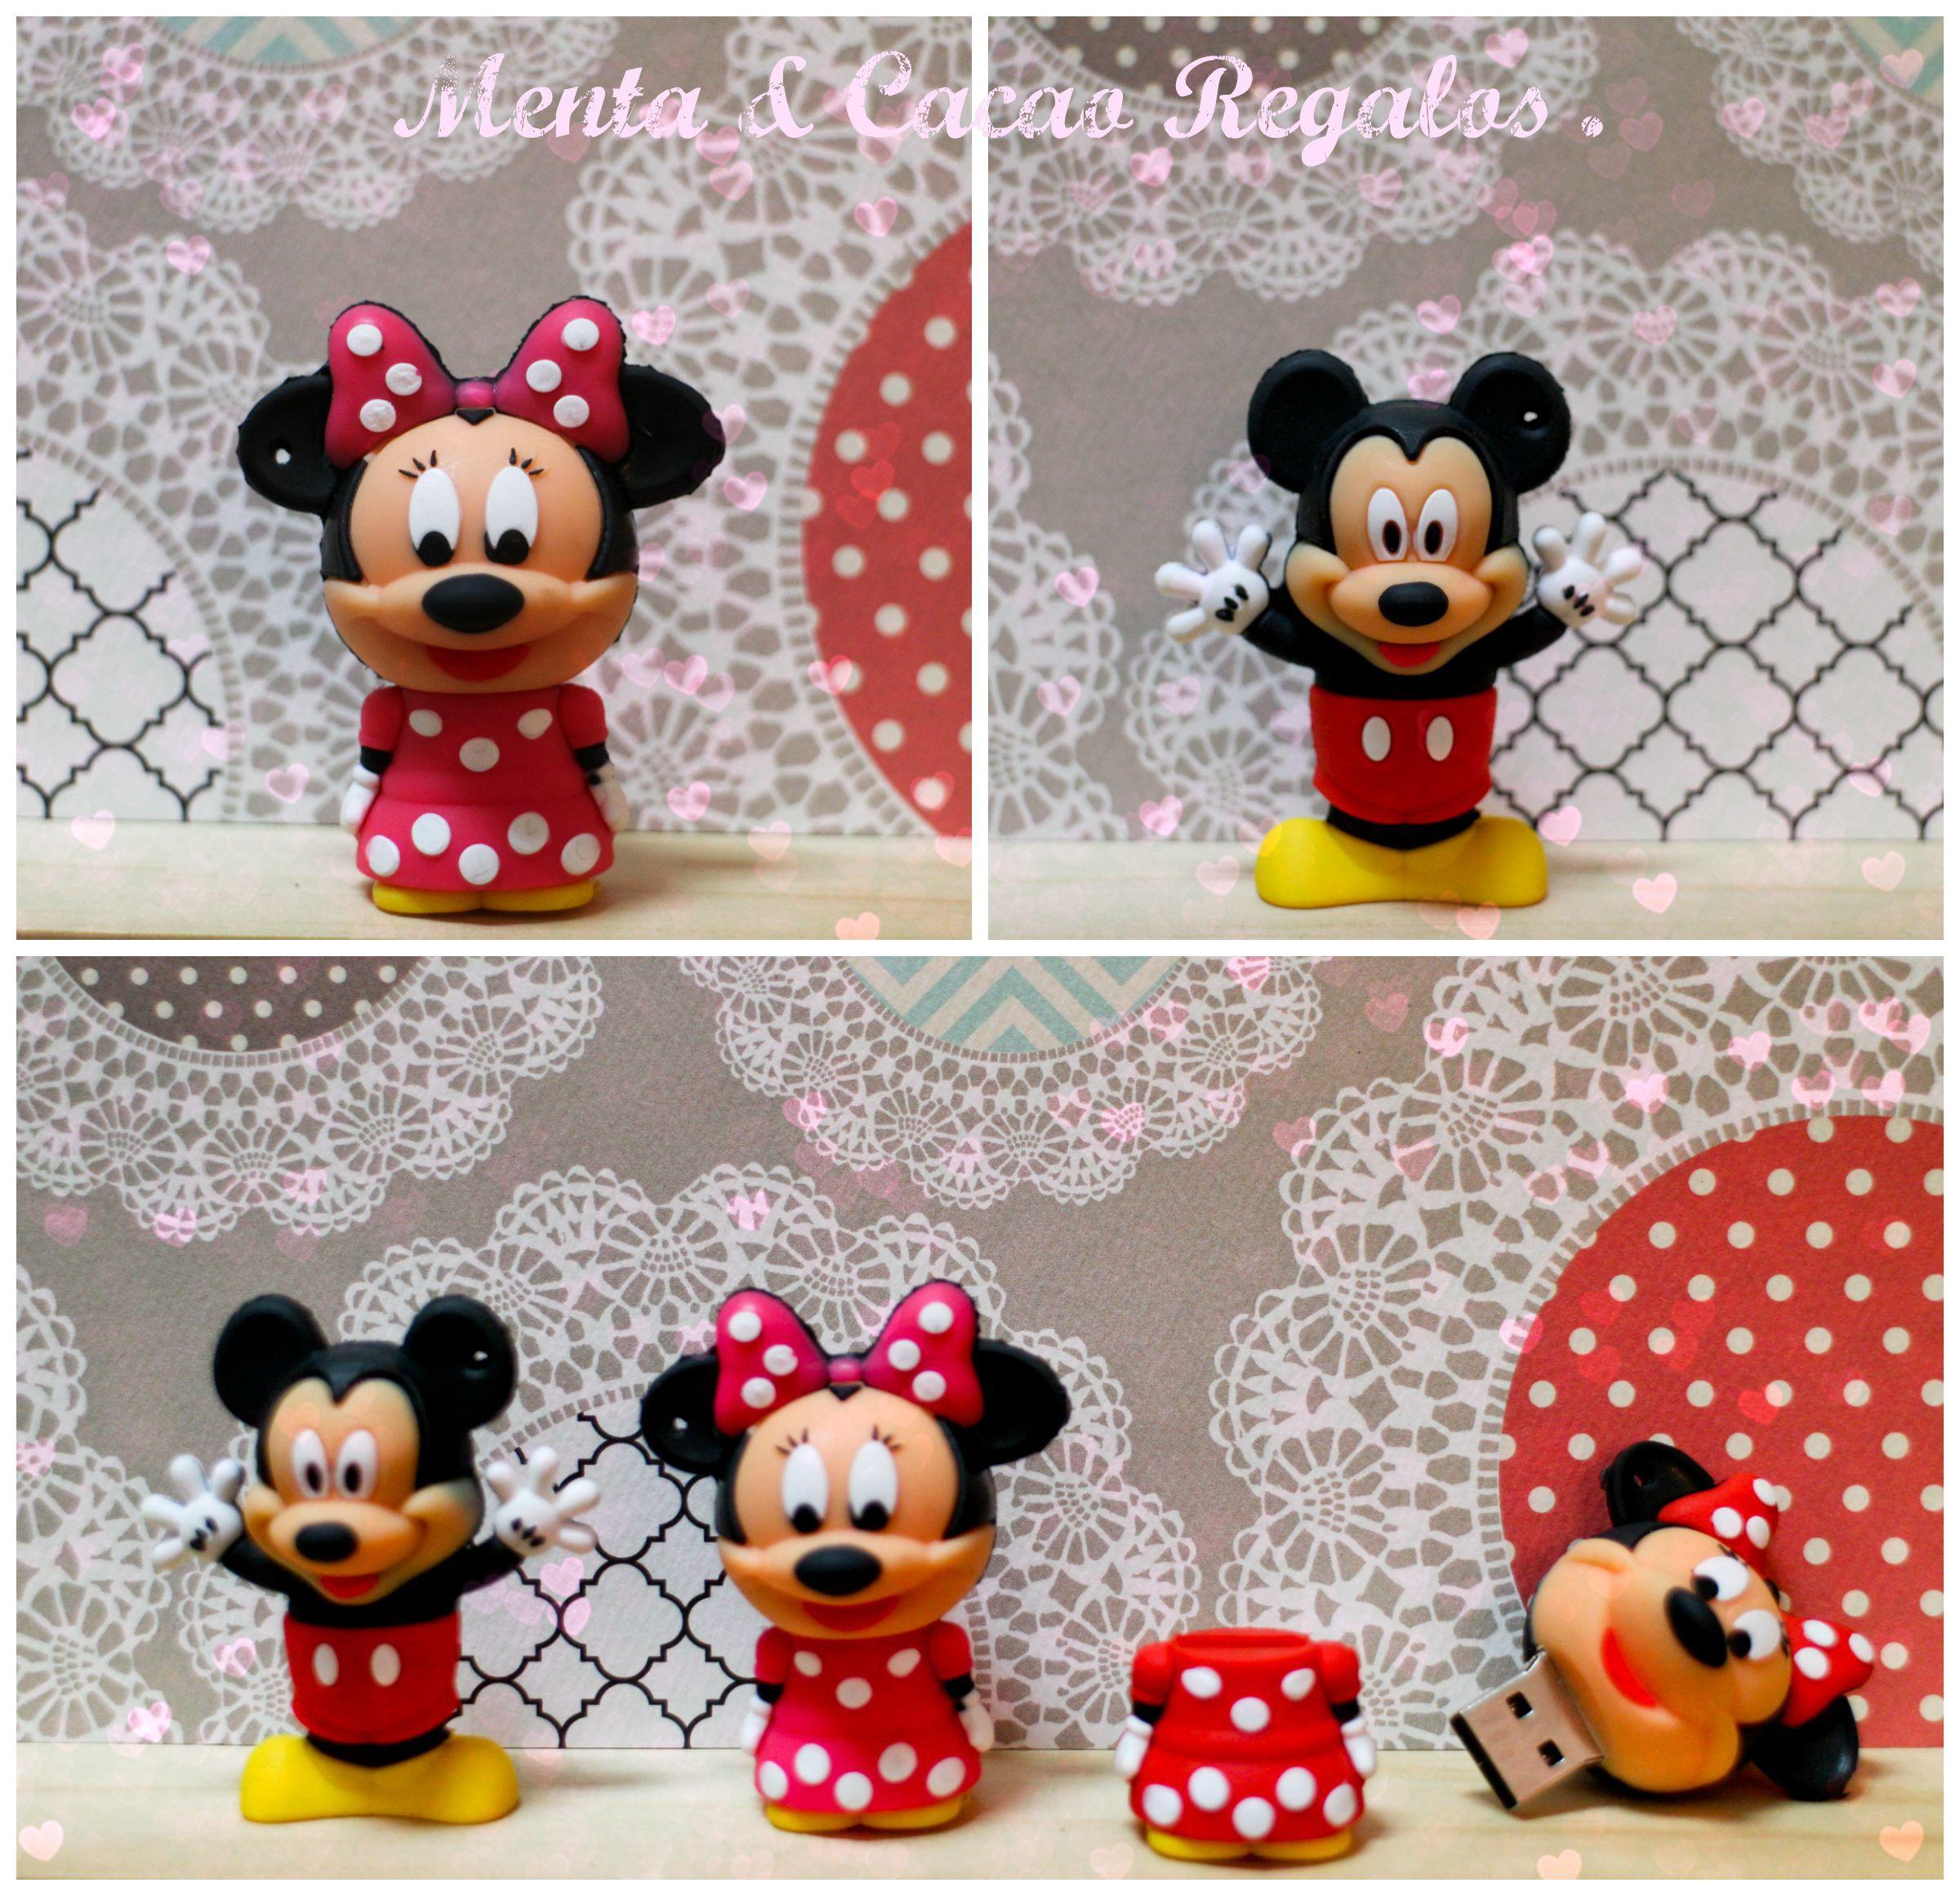 USB Micky and Minnie